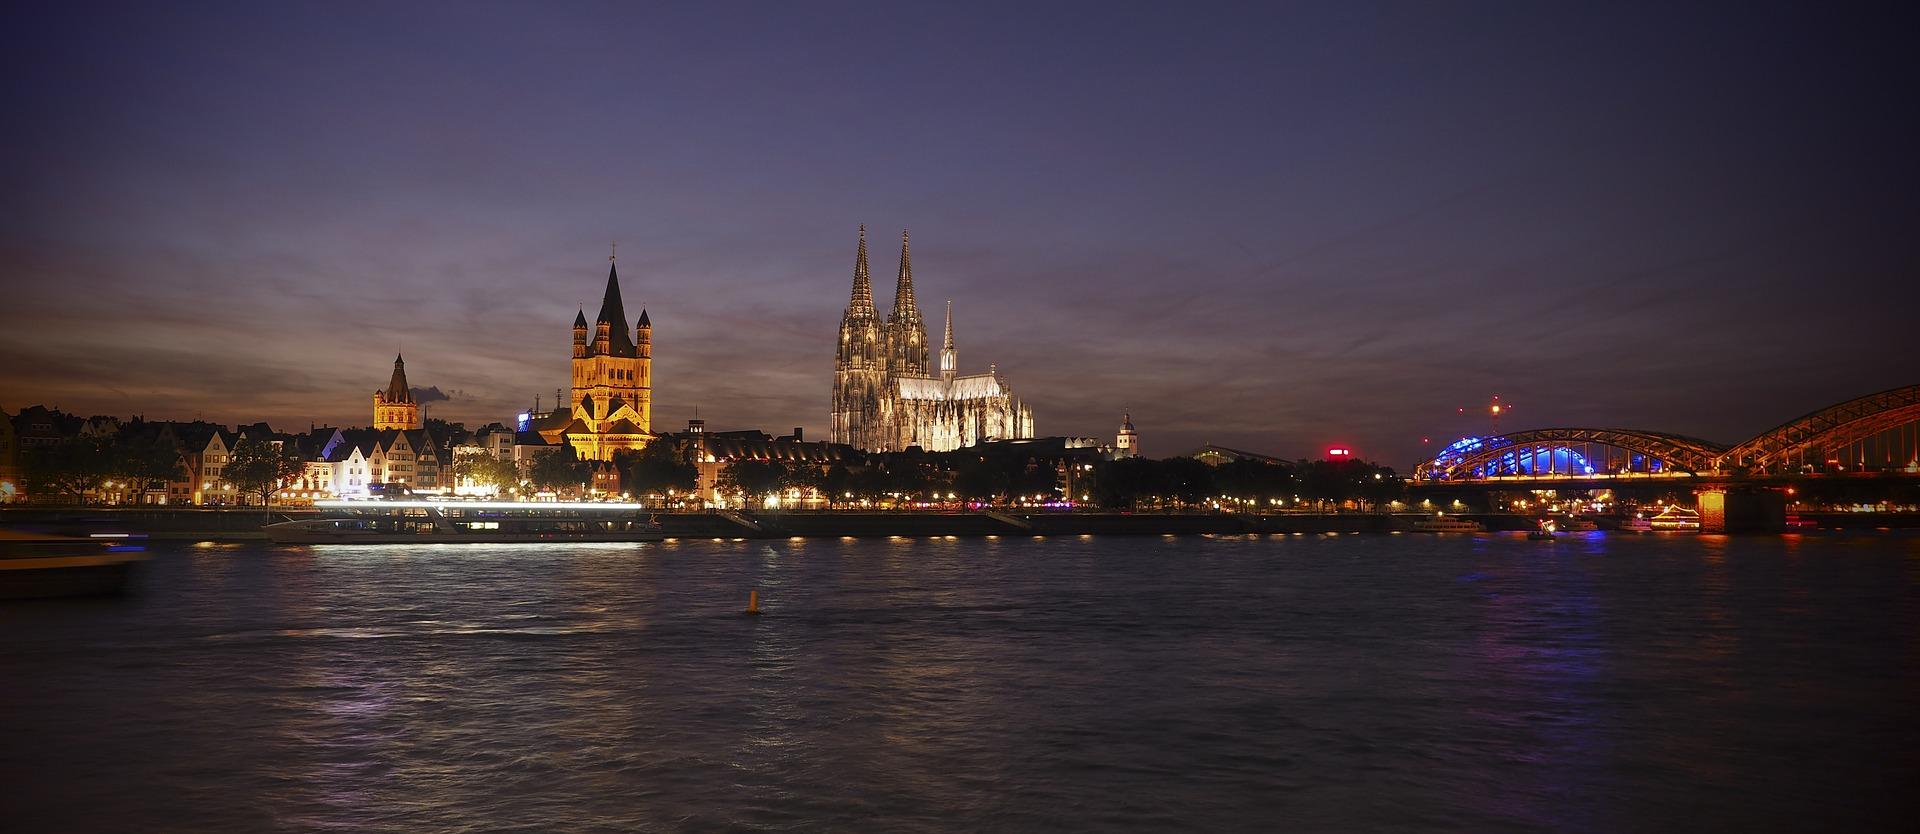 kölner altstadt bei nacht panorama kölner dom haxenhaus restaurant